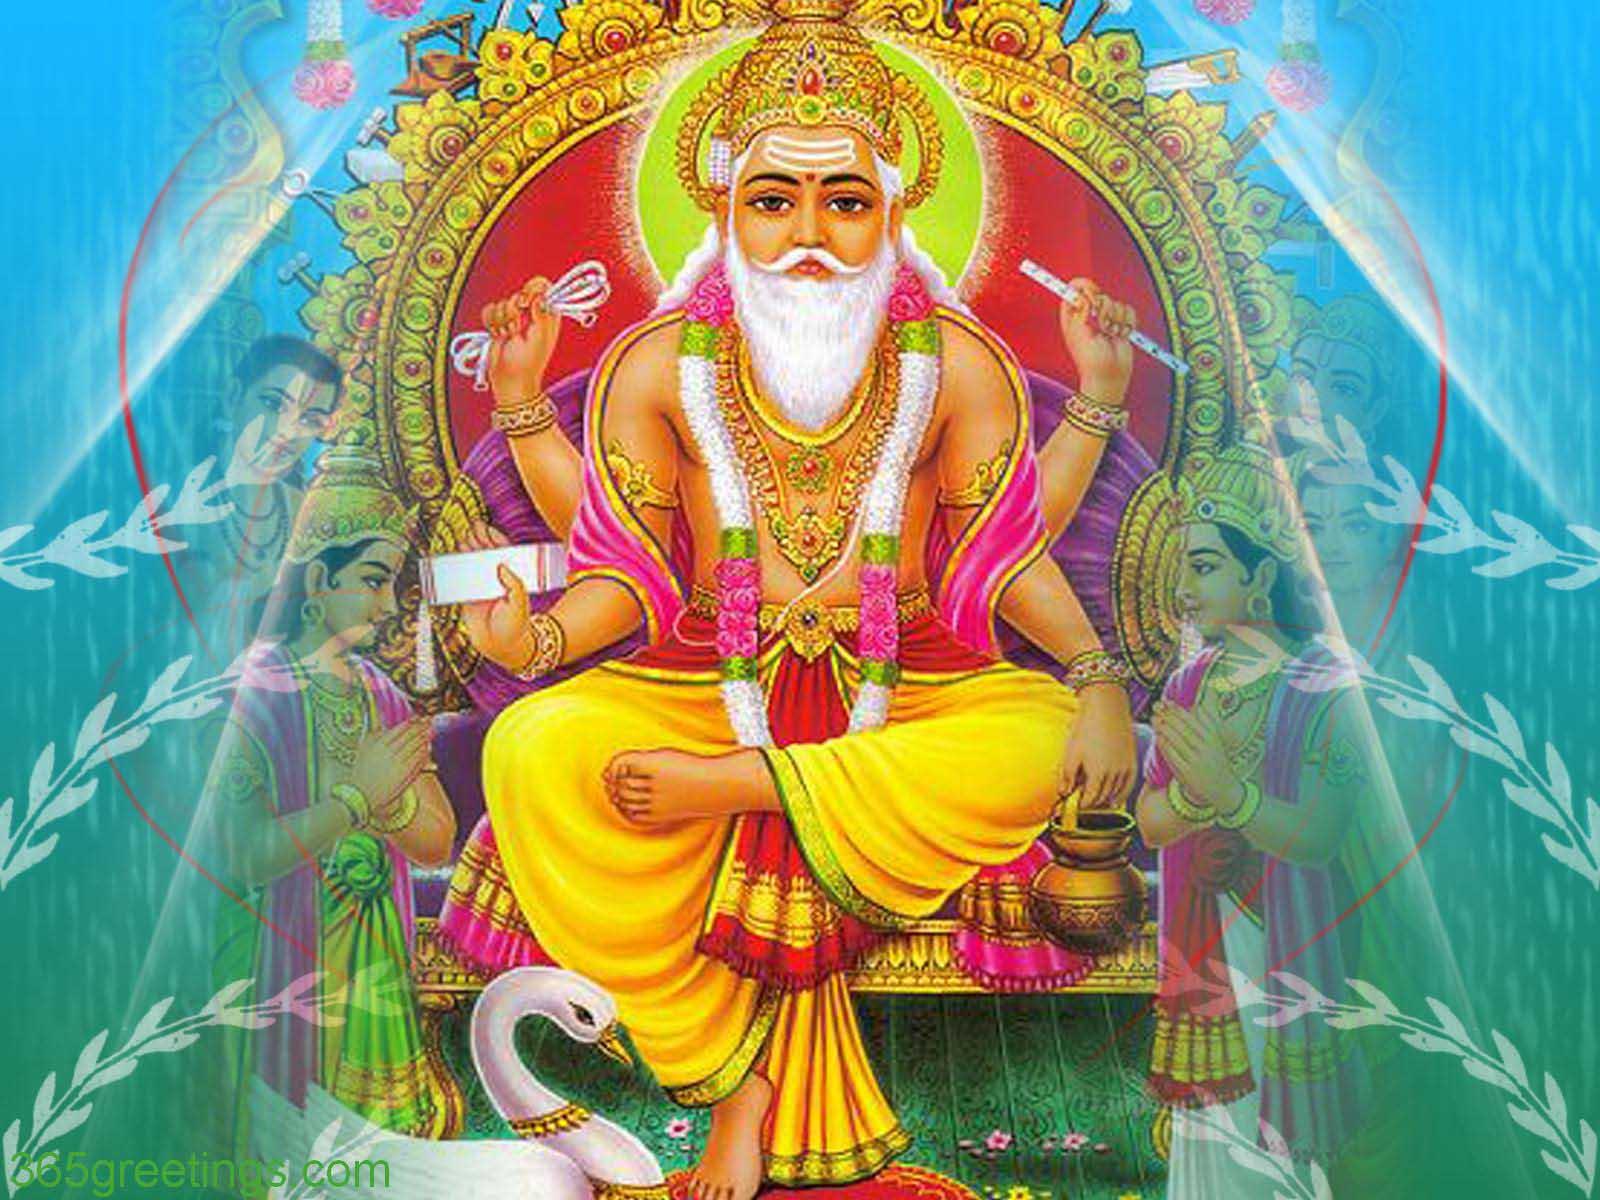 Good Wallpaper Lord Vishwakarma - lord-vishwakarma-hd-wallpaper-image-photo-picture  Photograph_392111.jpg